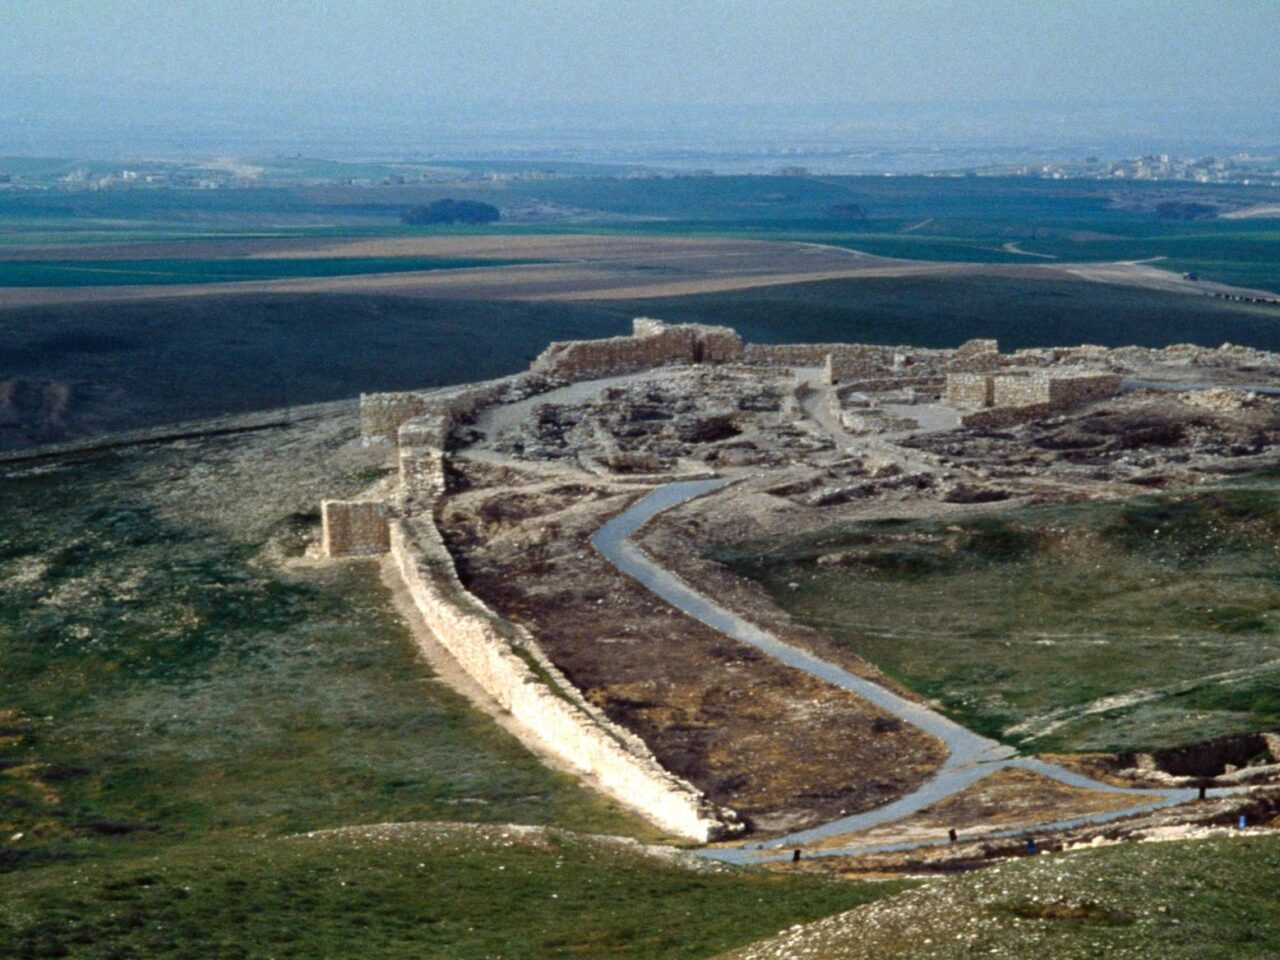 Local onde foi encontrado o templo da era bíblica